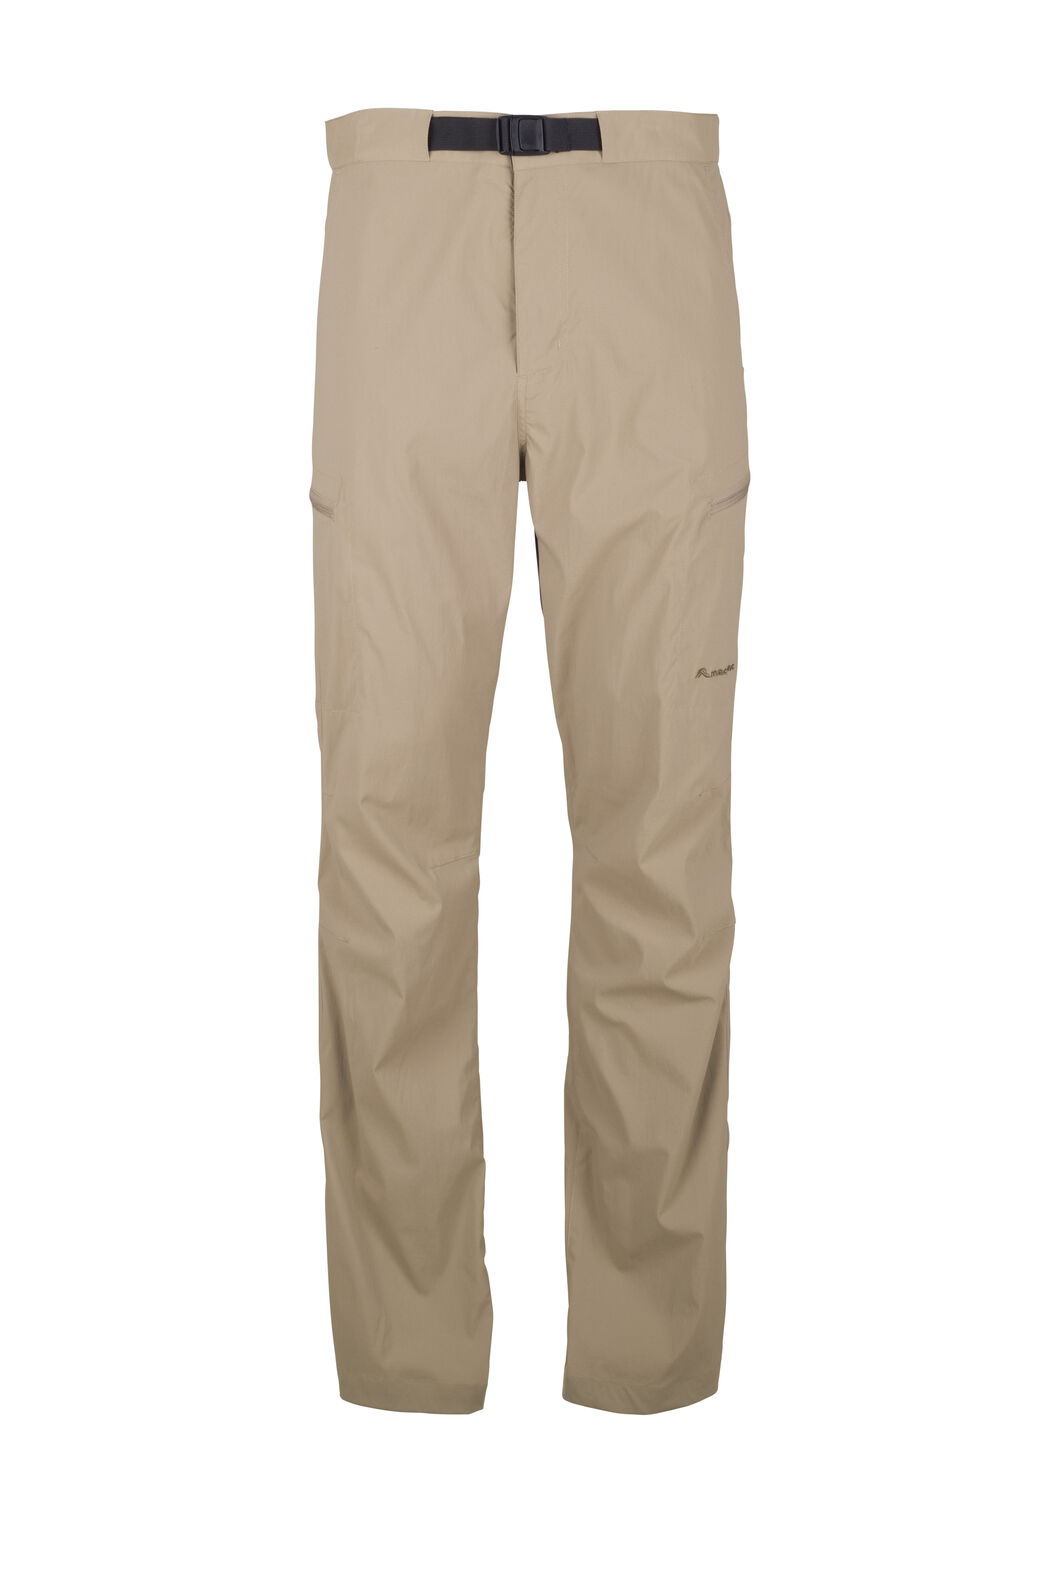 Macpac Drift Pants - Men's, Covert Green, hi-res